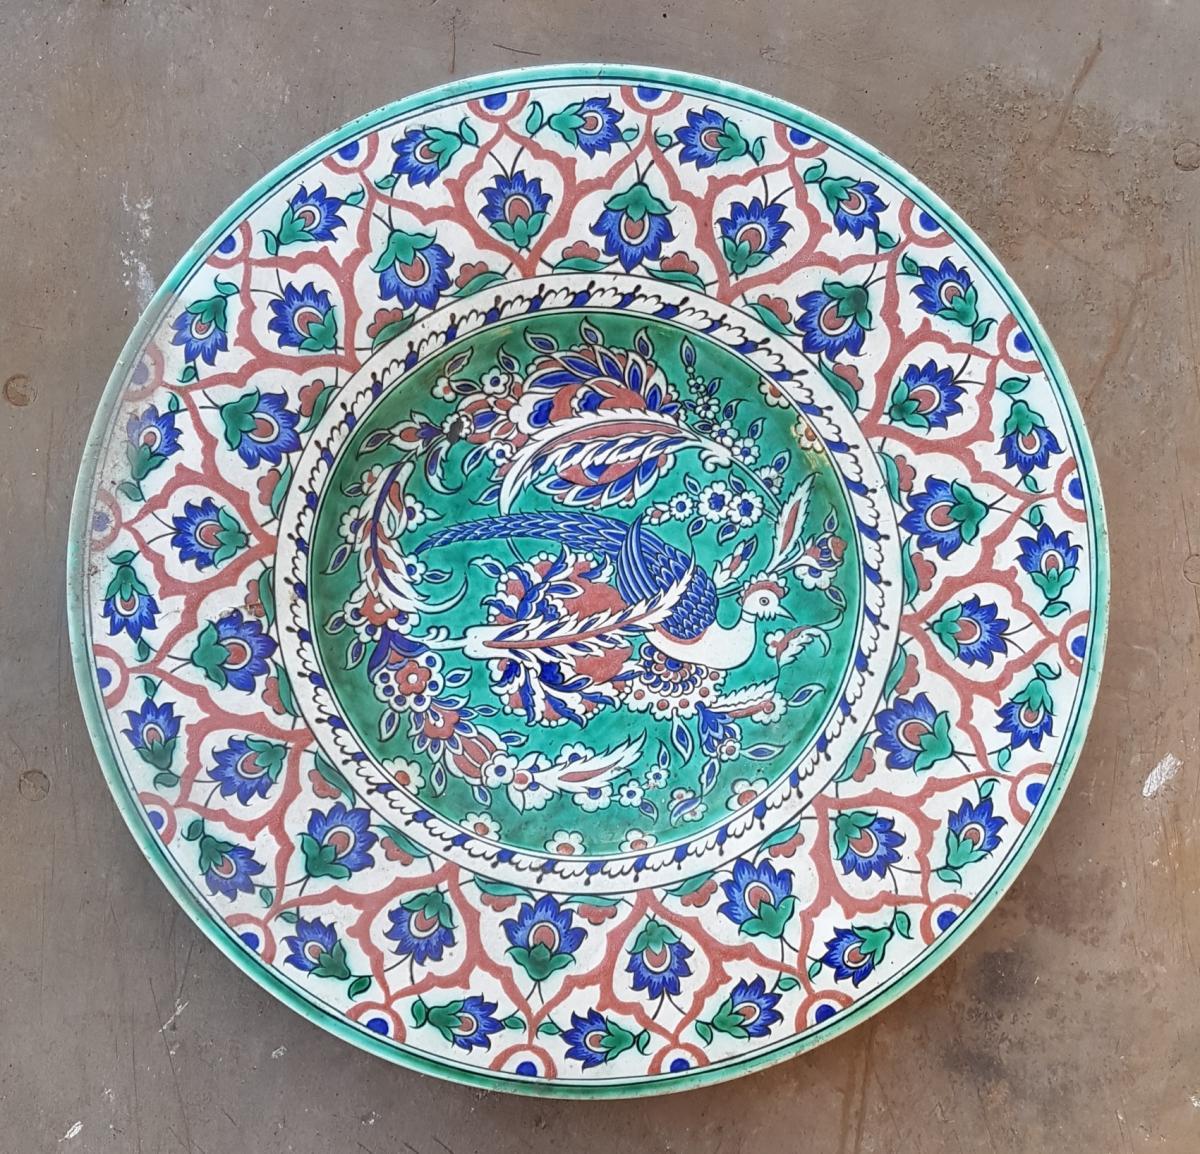 Large Circular Dish In Earthenware Iznik Blue Signed Bfk- Boch Freres Keramis